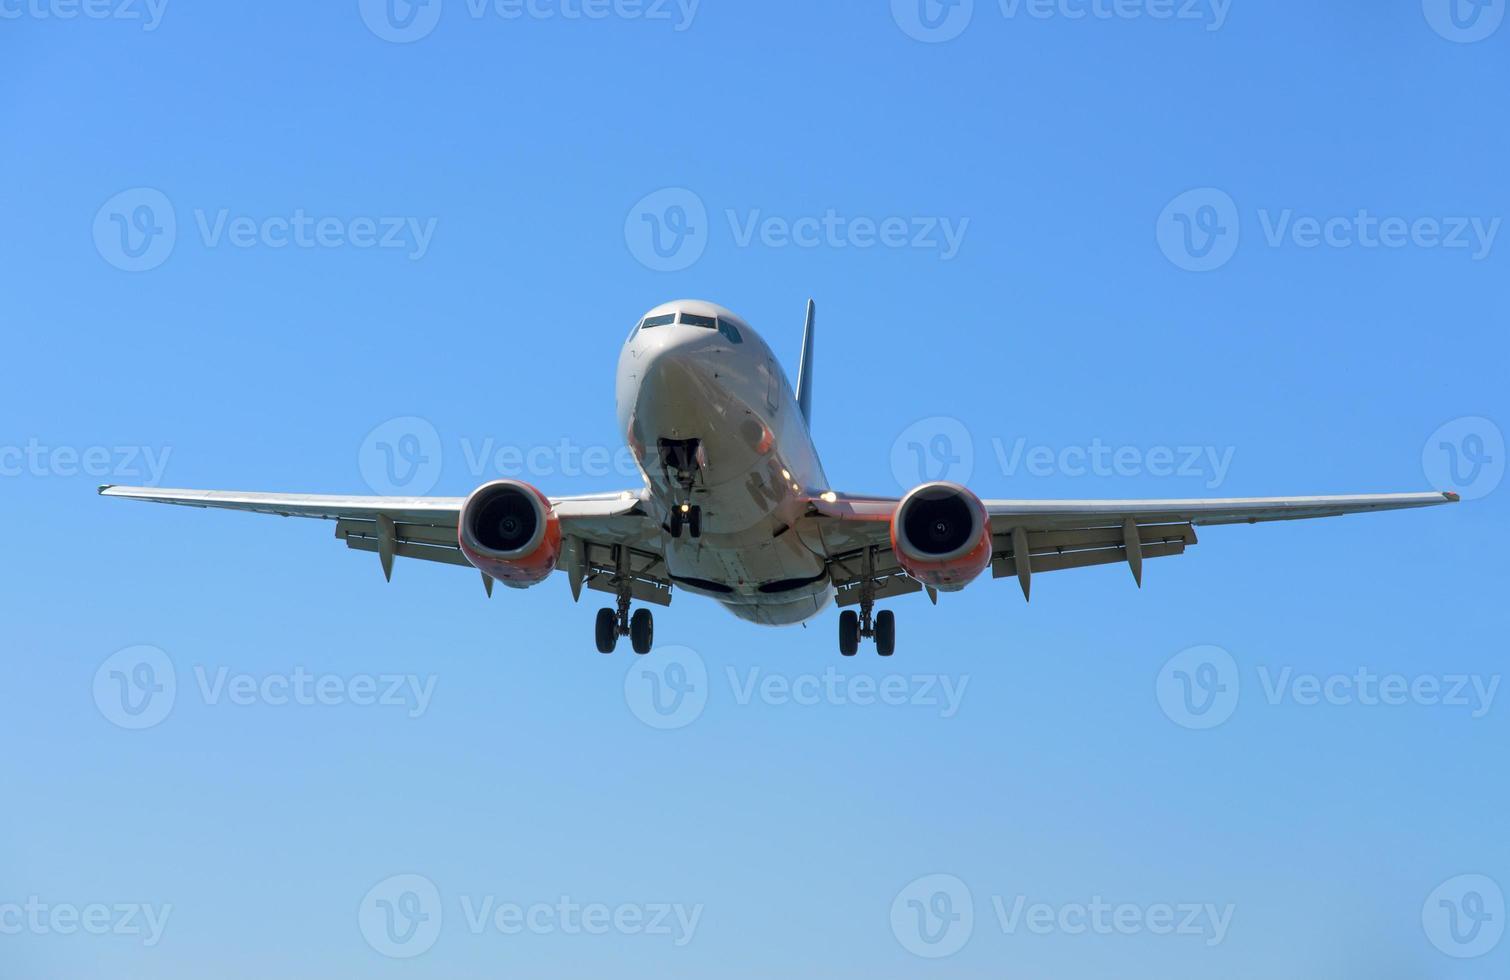 Airpane in flight photo